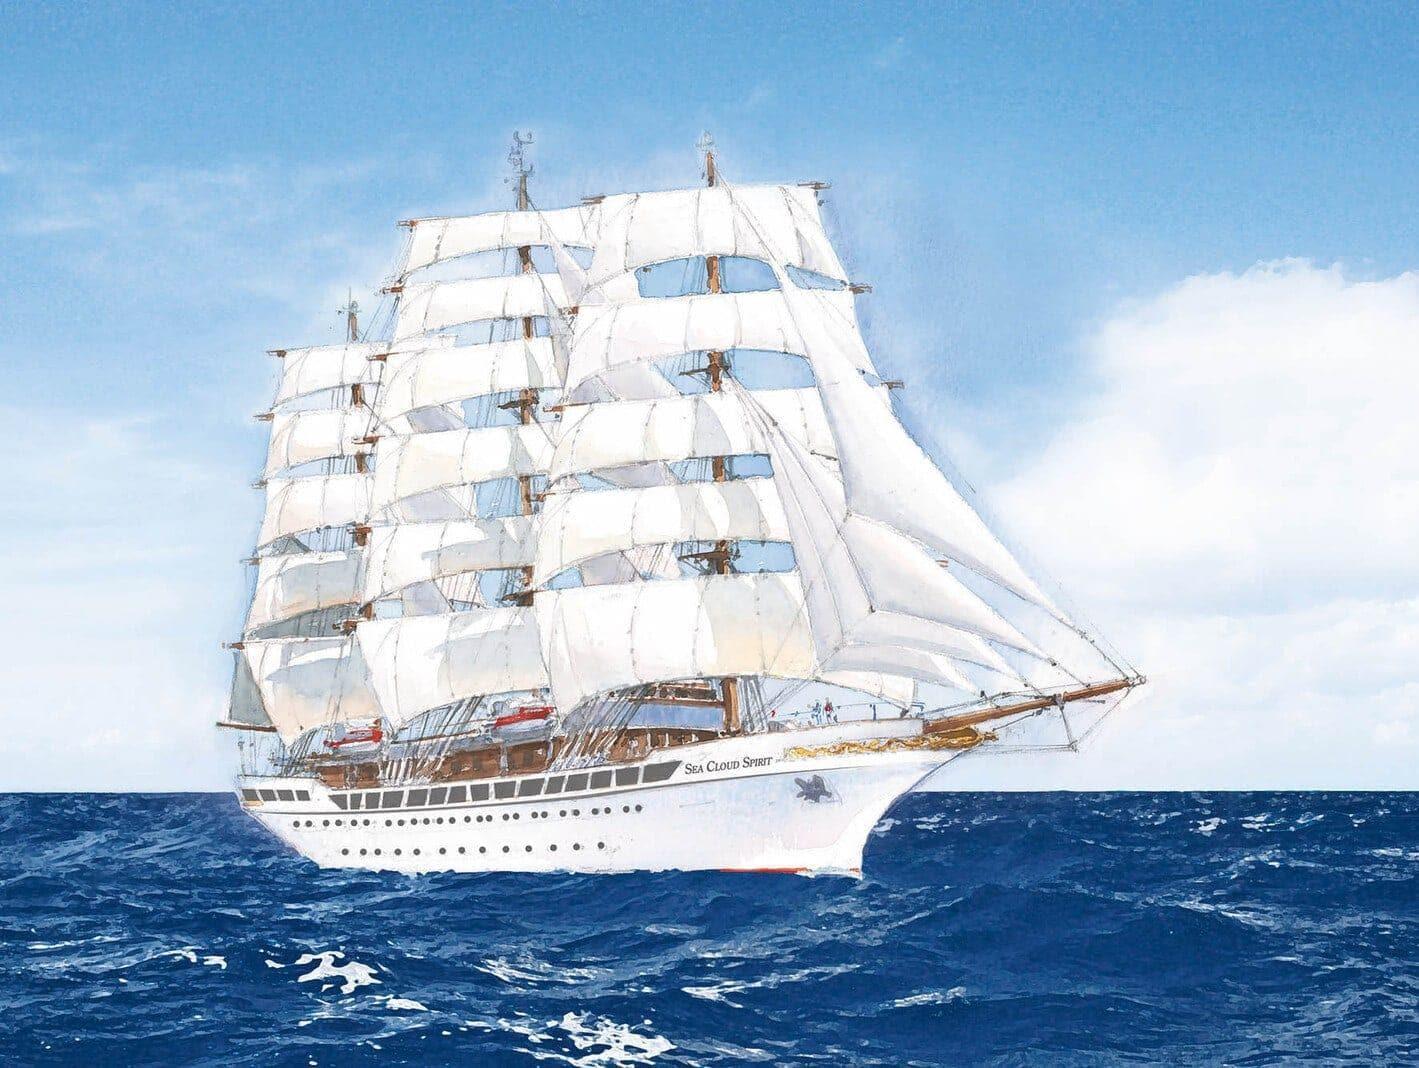 Kreuzfahrtschiff Sea Cloud Spirit